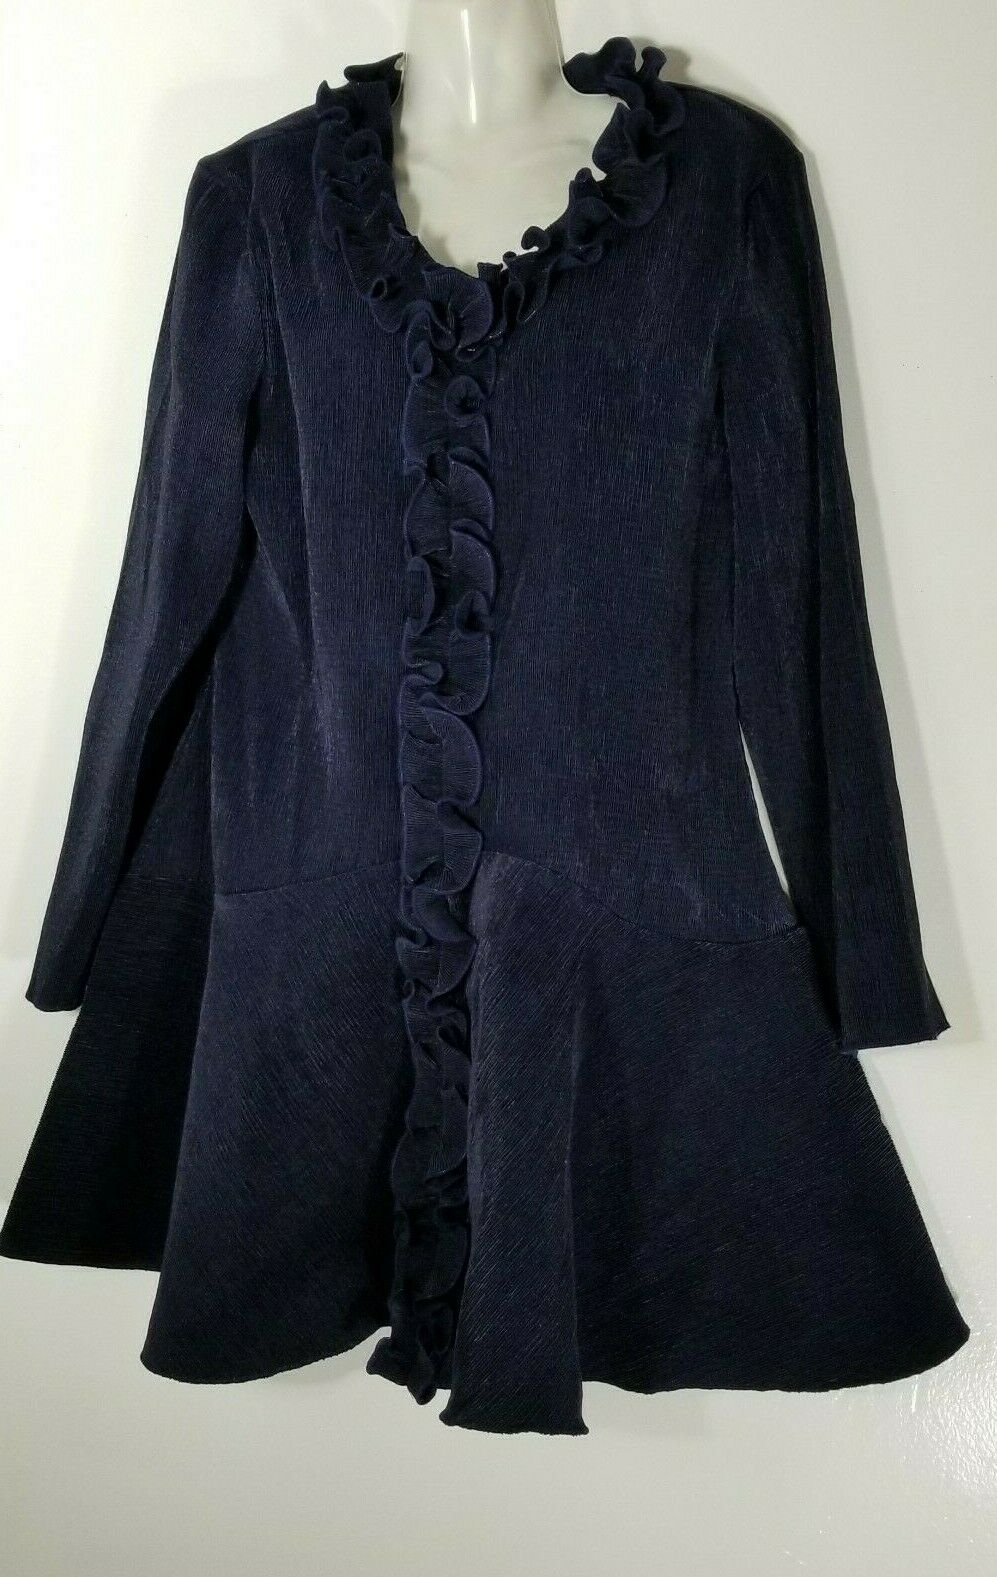 Jerry T Woherren Navy Blau Long Sleeve Tunic Dress 1X 18 20 Plus SR 3373 NWT New